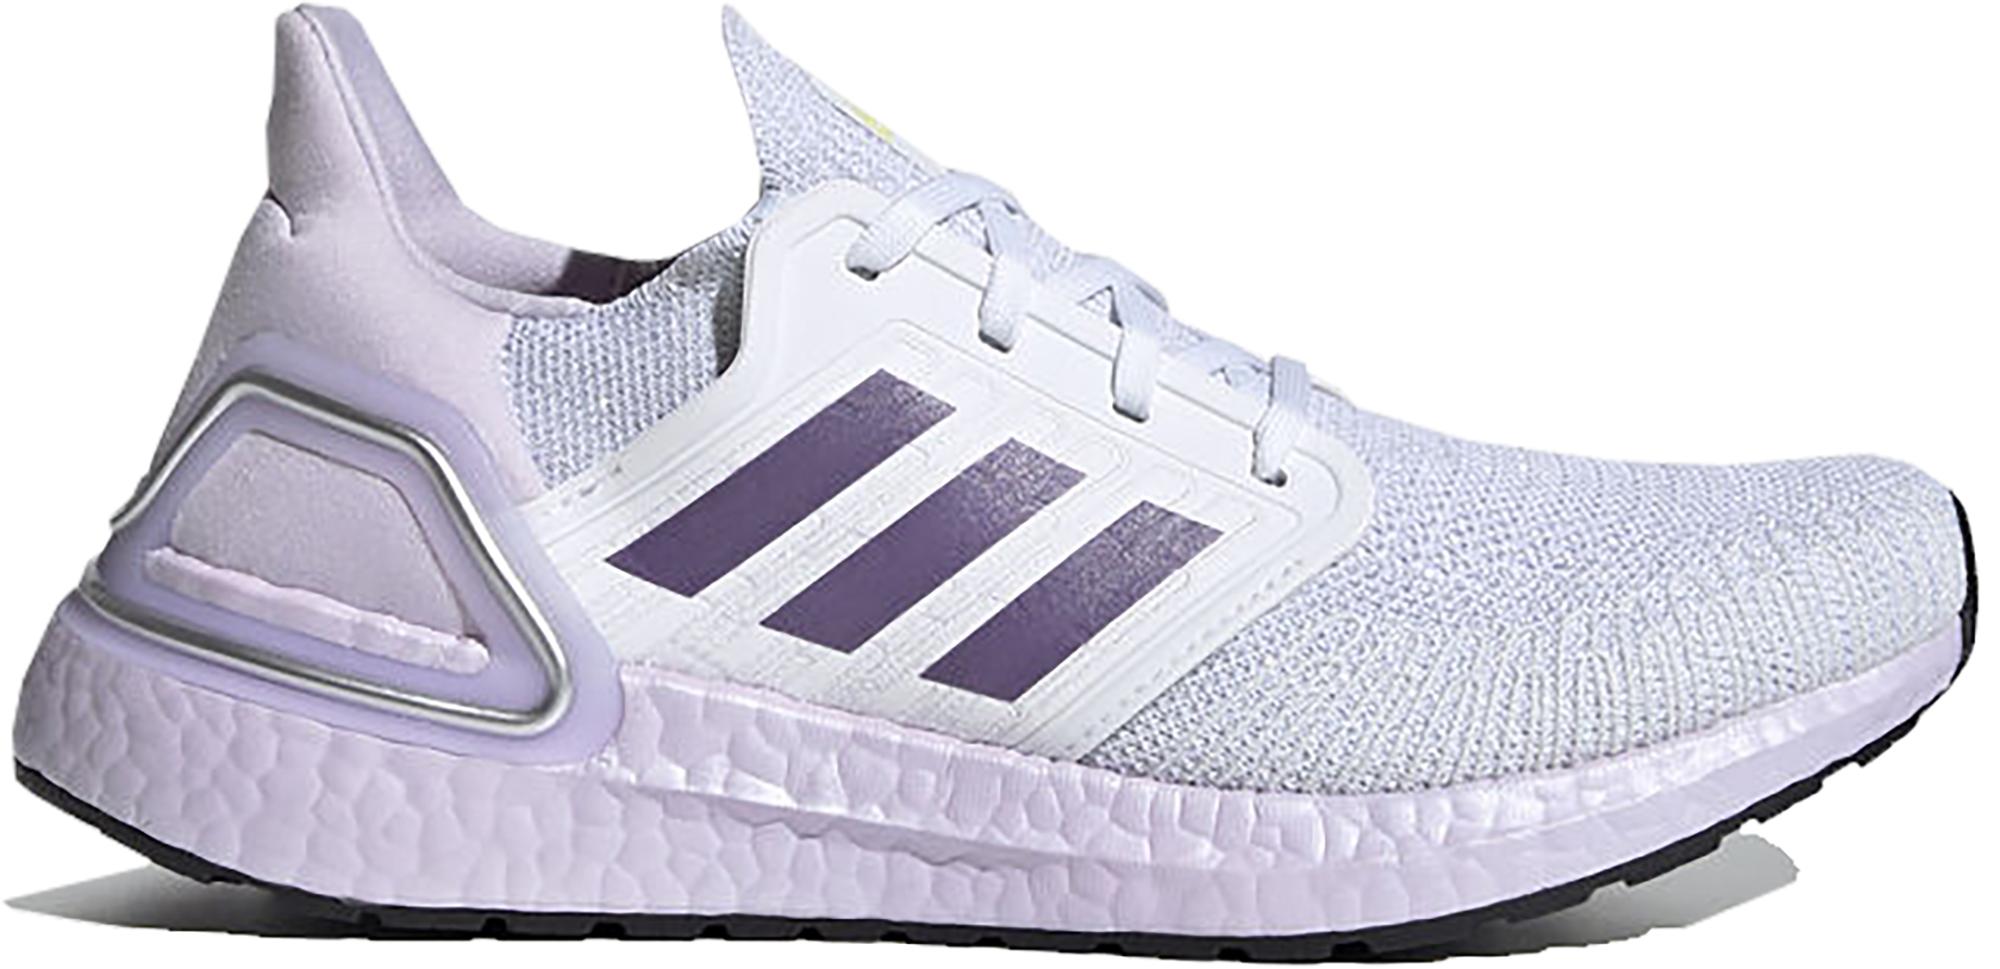 adidas Ultra Boost 20 White Tech Purple